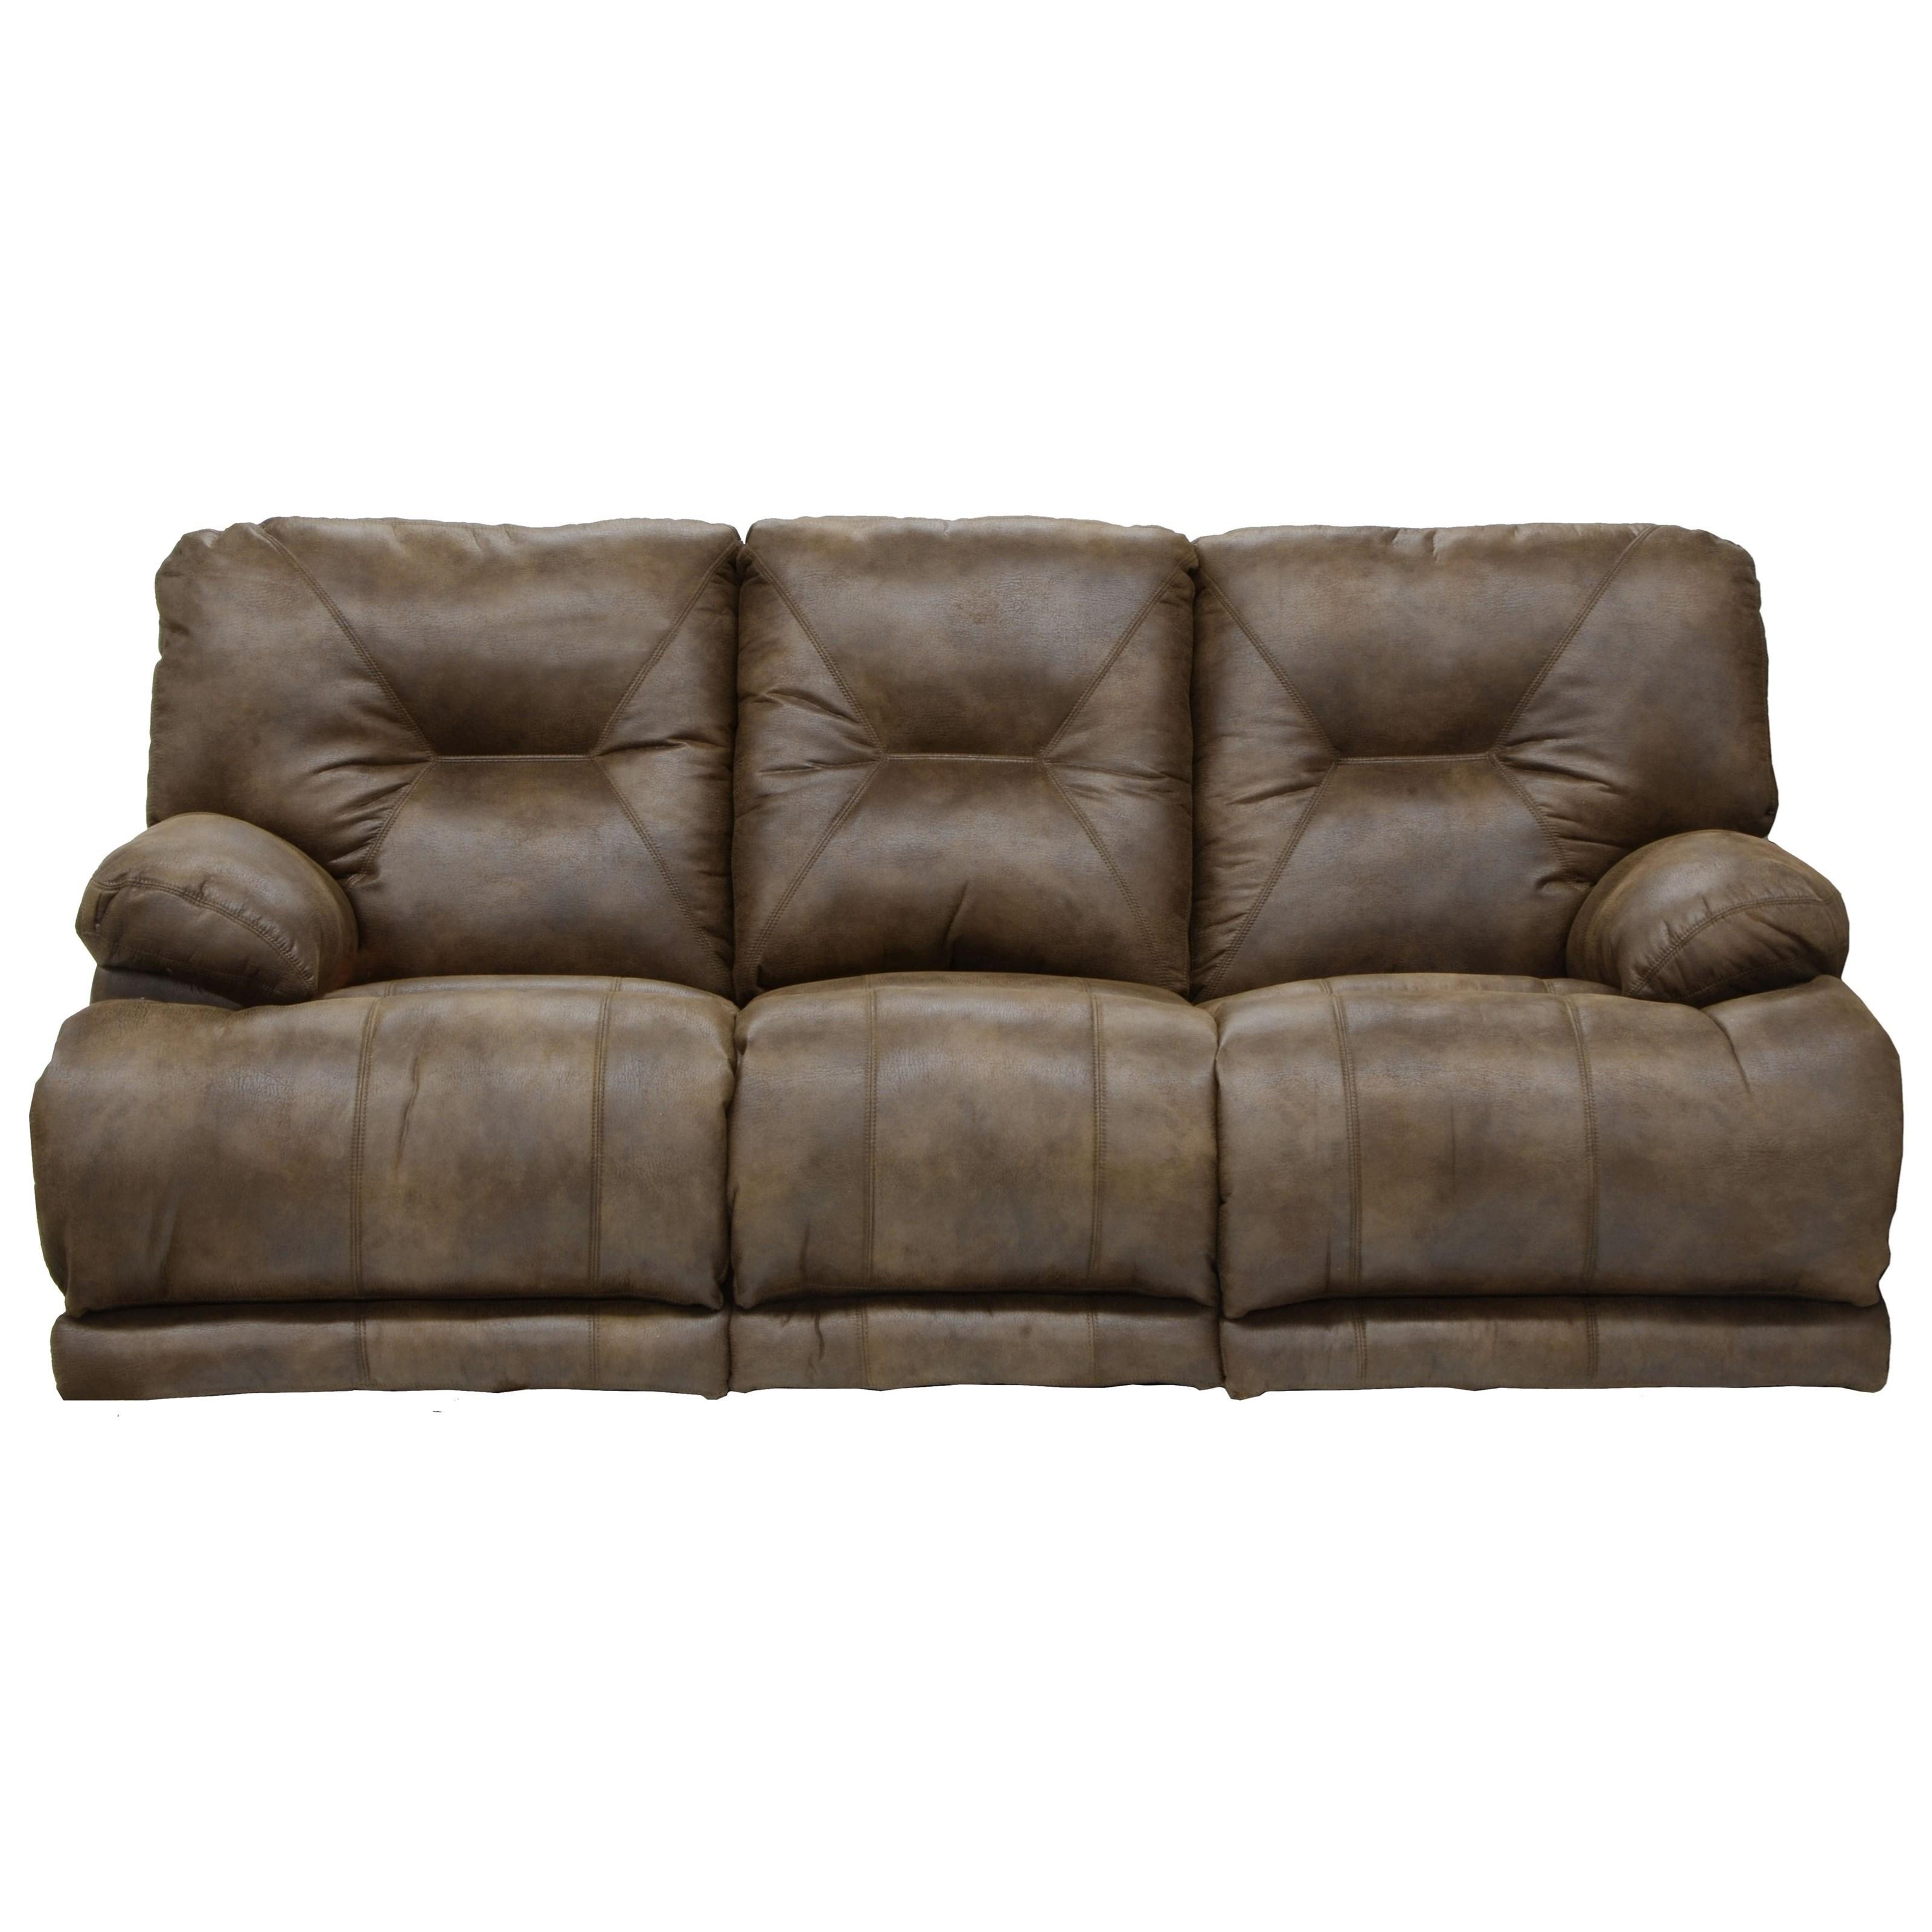 catnapper sofas and loveseats harris tweed bowmore midi sofa voyager 43845 3 seat